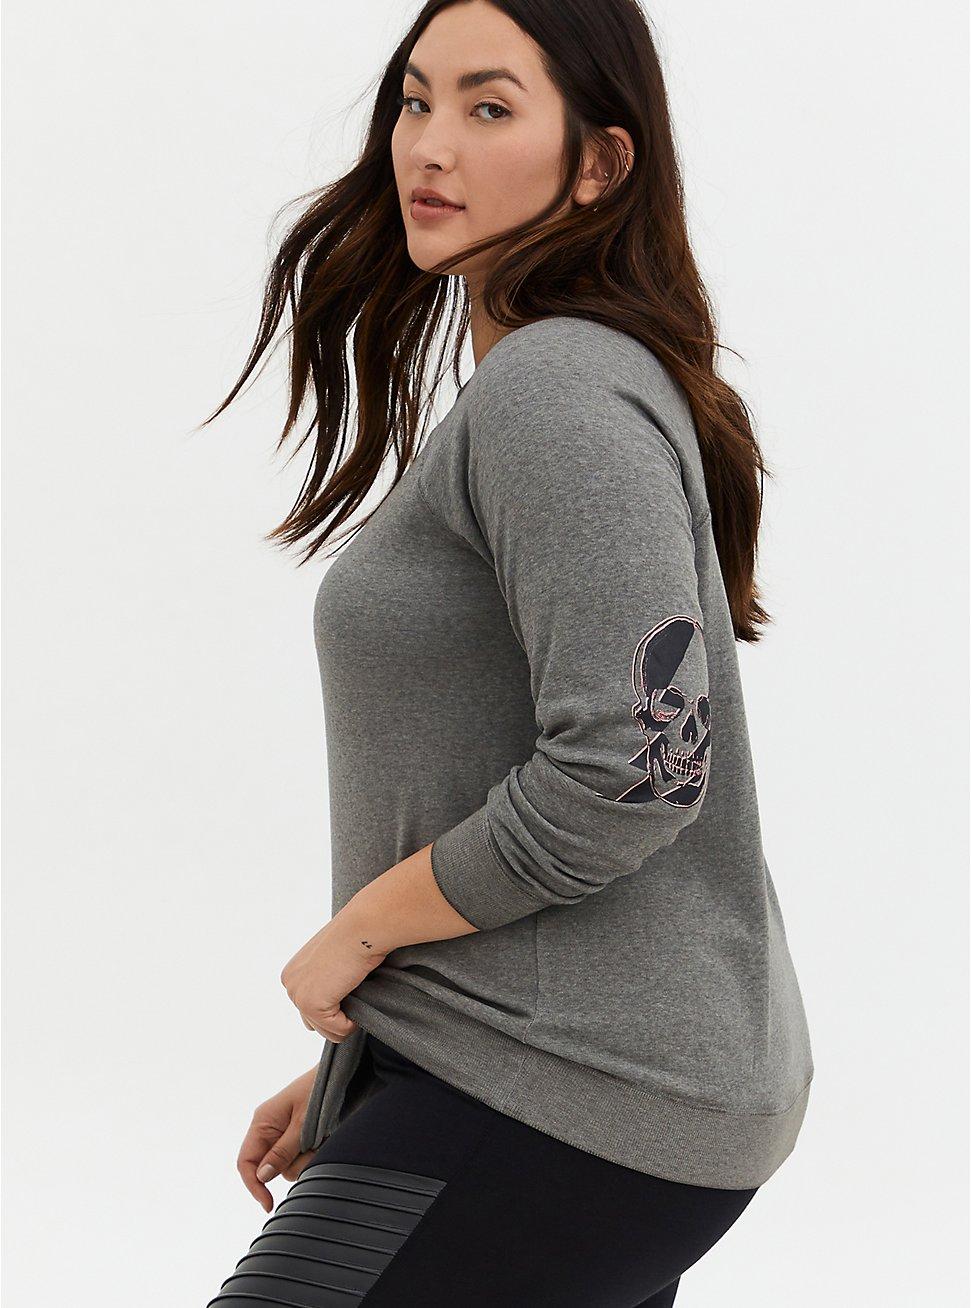 Heather Gray Skull Fleece Burnout Raglan Sweatshirt, MEDIUM HEATHER GREY, hi-res